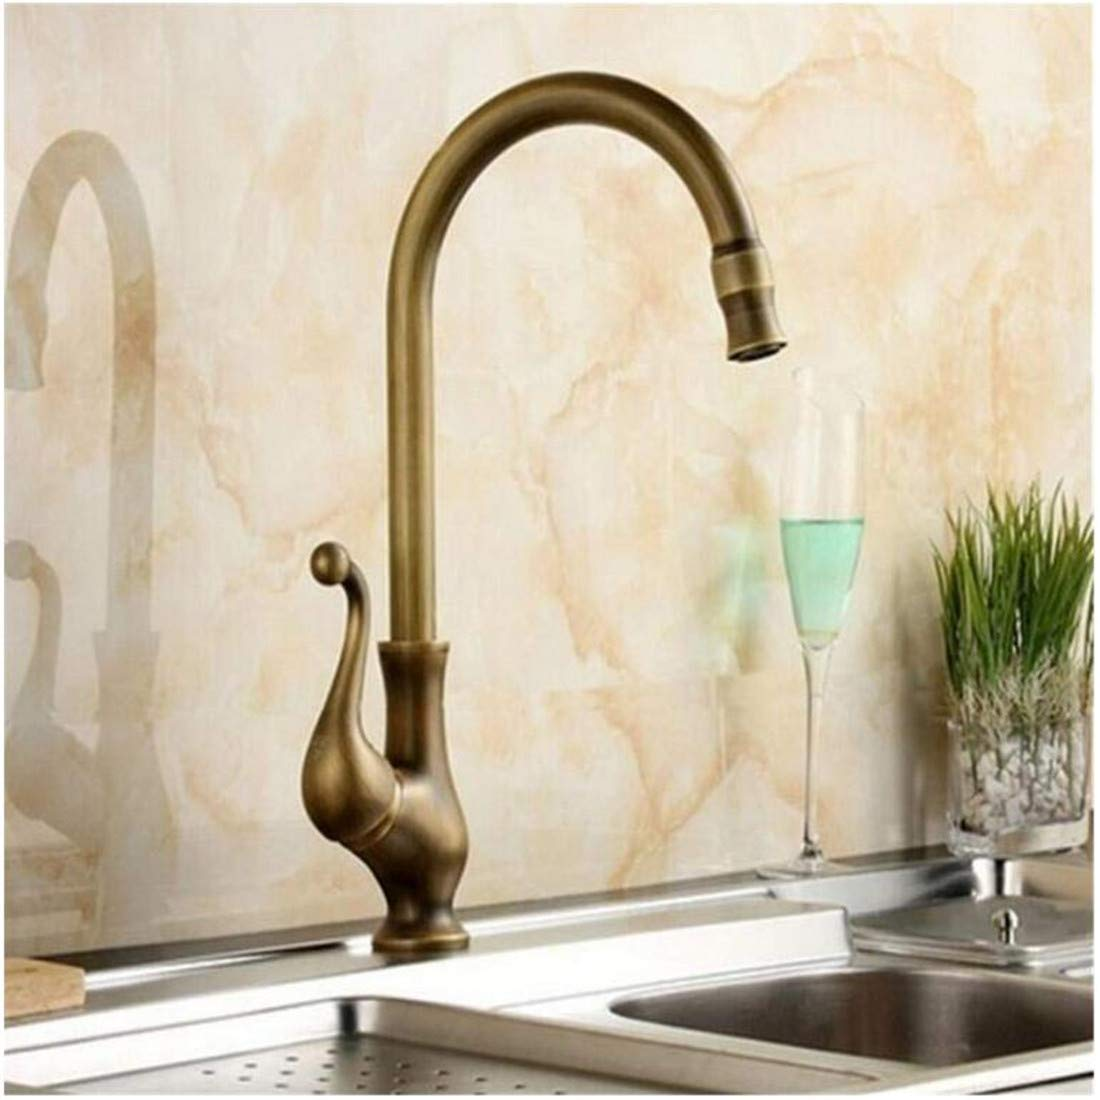 Modern High Quality Vintage Faucetfaucet Design Crane Antique Brass Mixer Tap